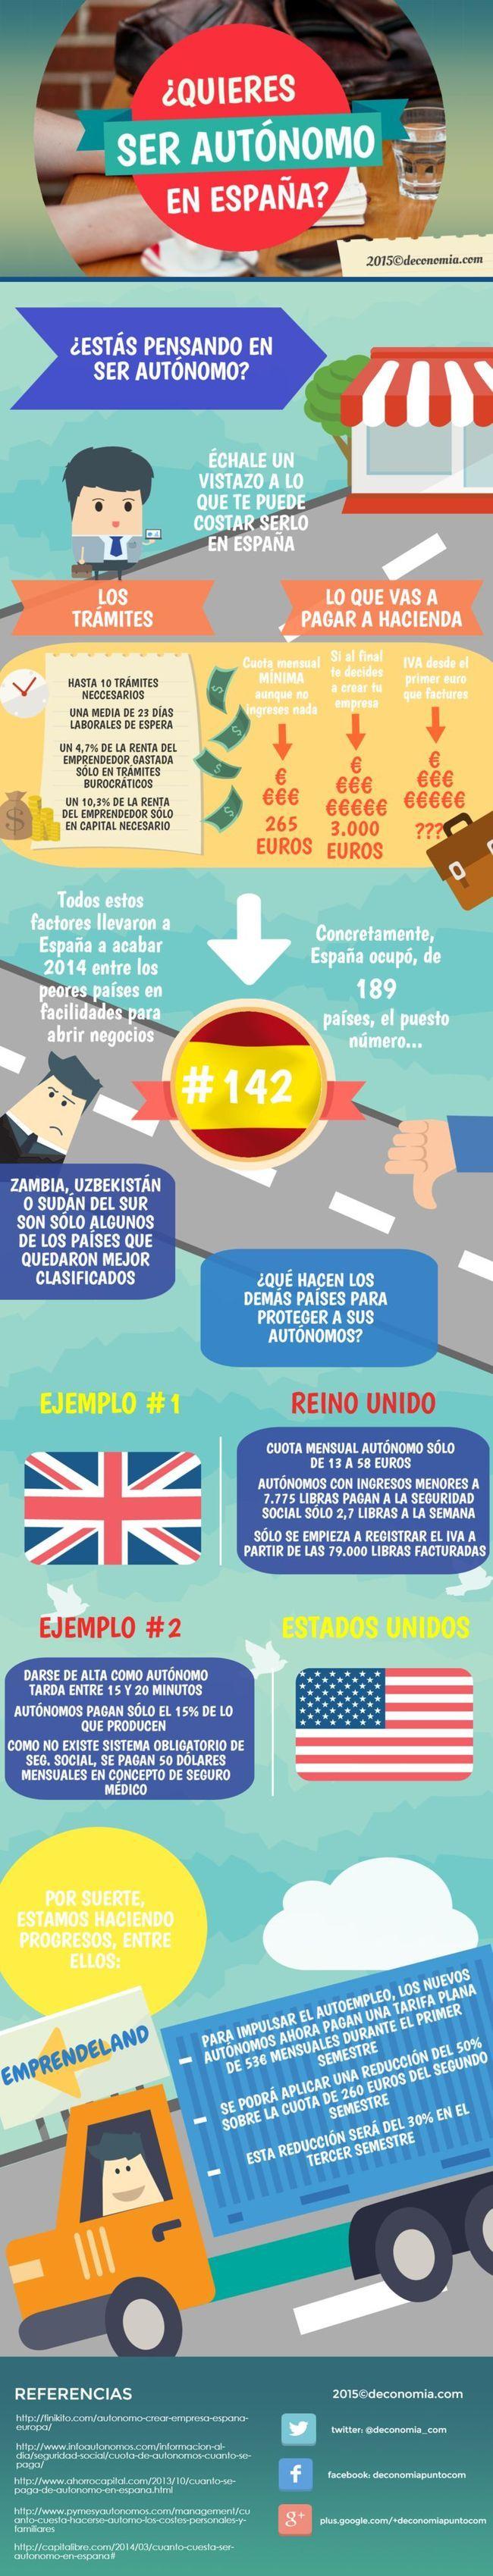 Autónomo en España… ¿vale la pena? - Forbes